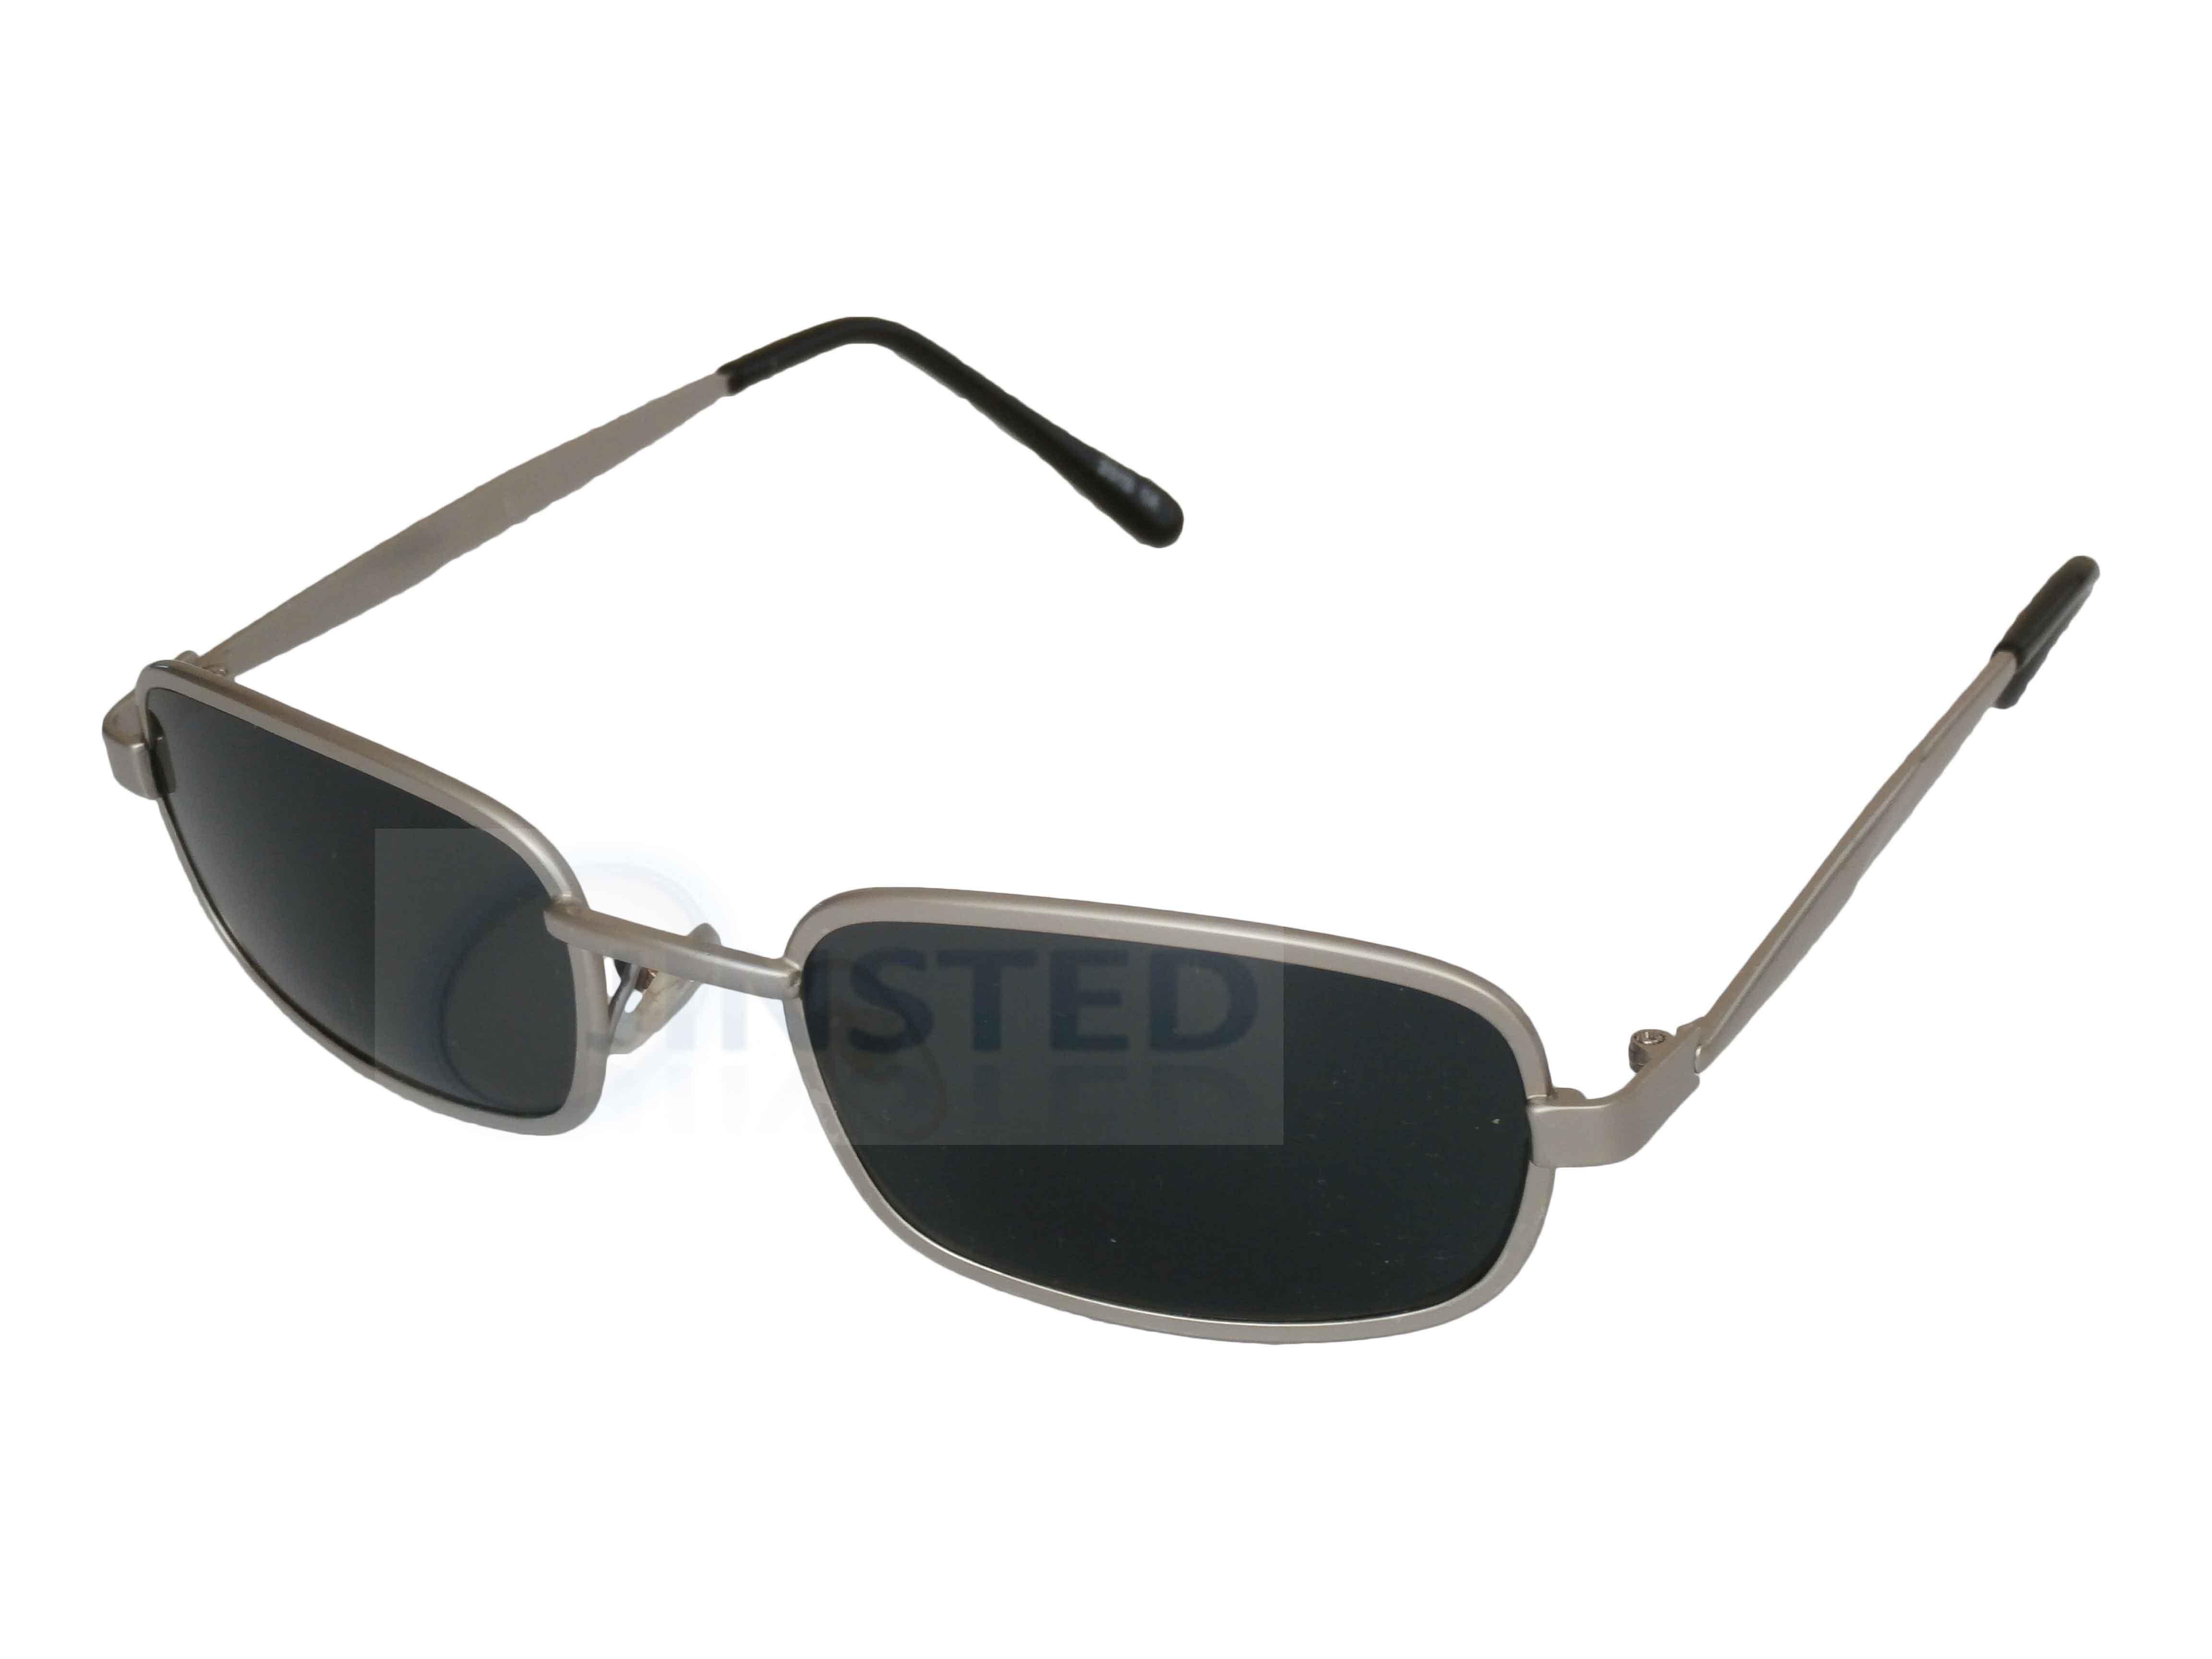 be224dd0af Unisex Alta Calidad Gafas de Sol Plateada Montura Oscuro Lentes ...